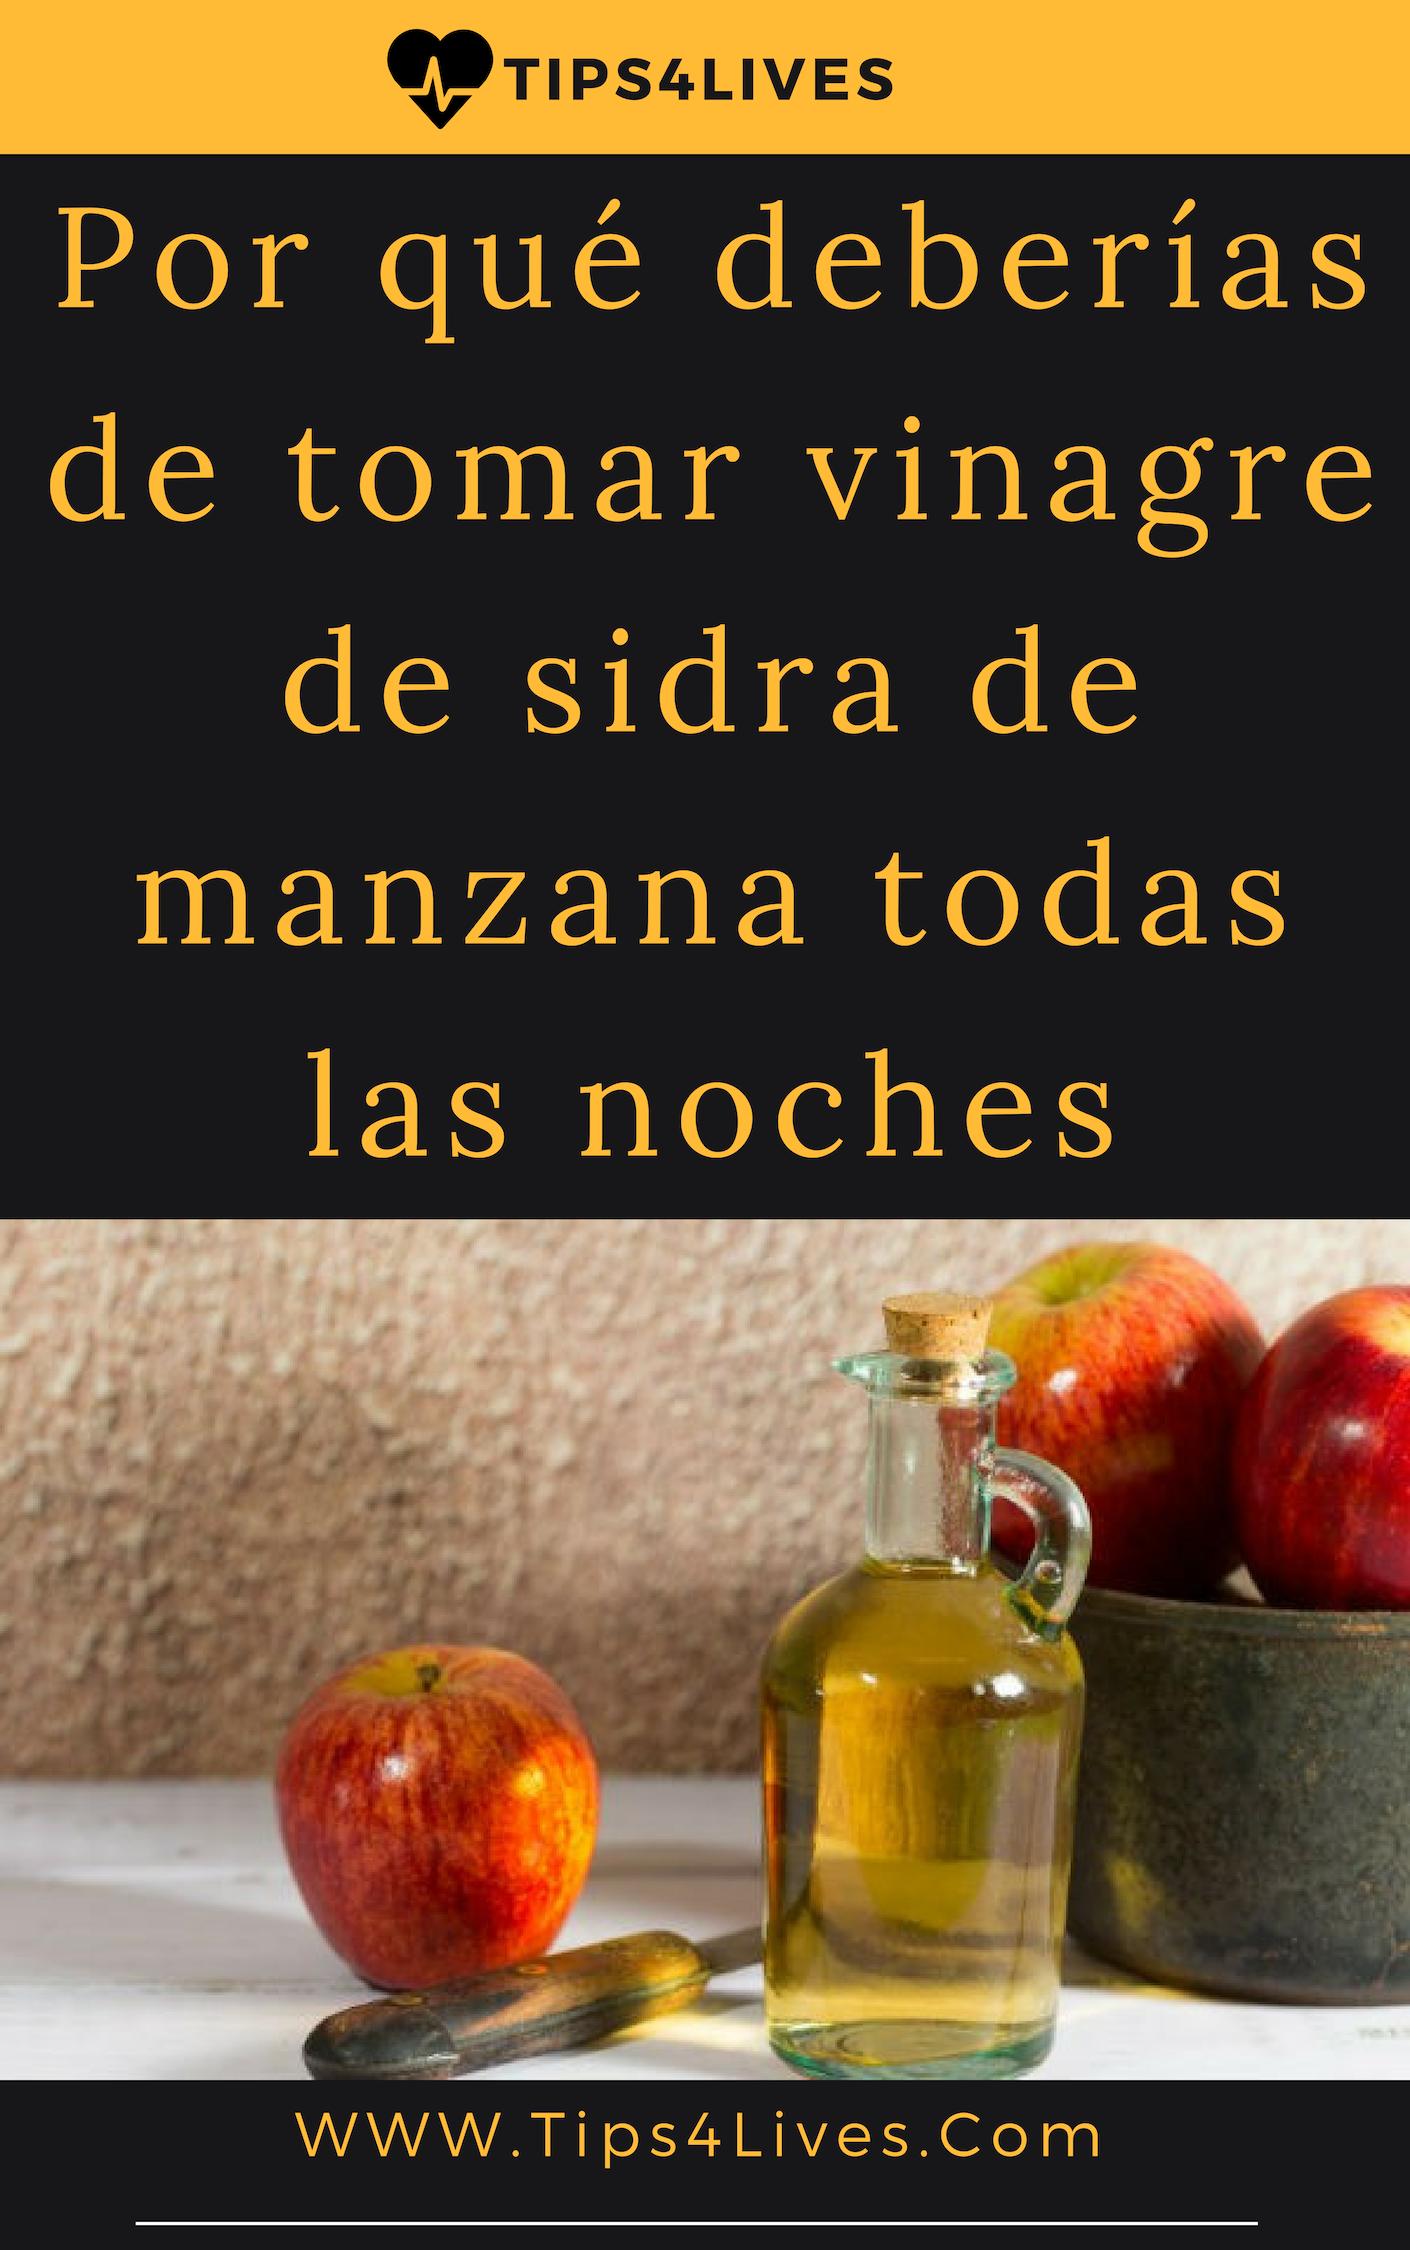 Como tomar la sidra de manzana para adelgazar